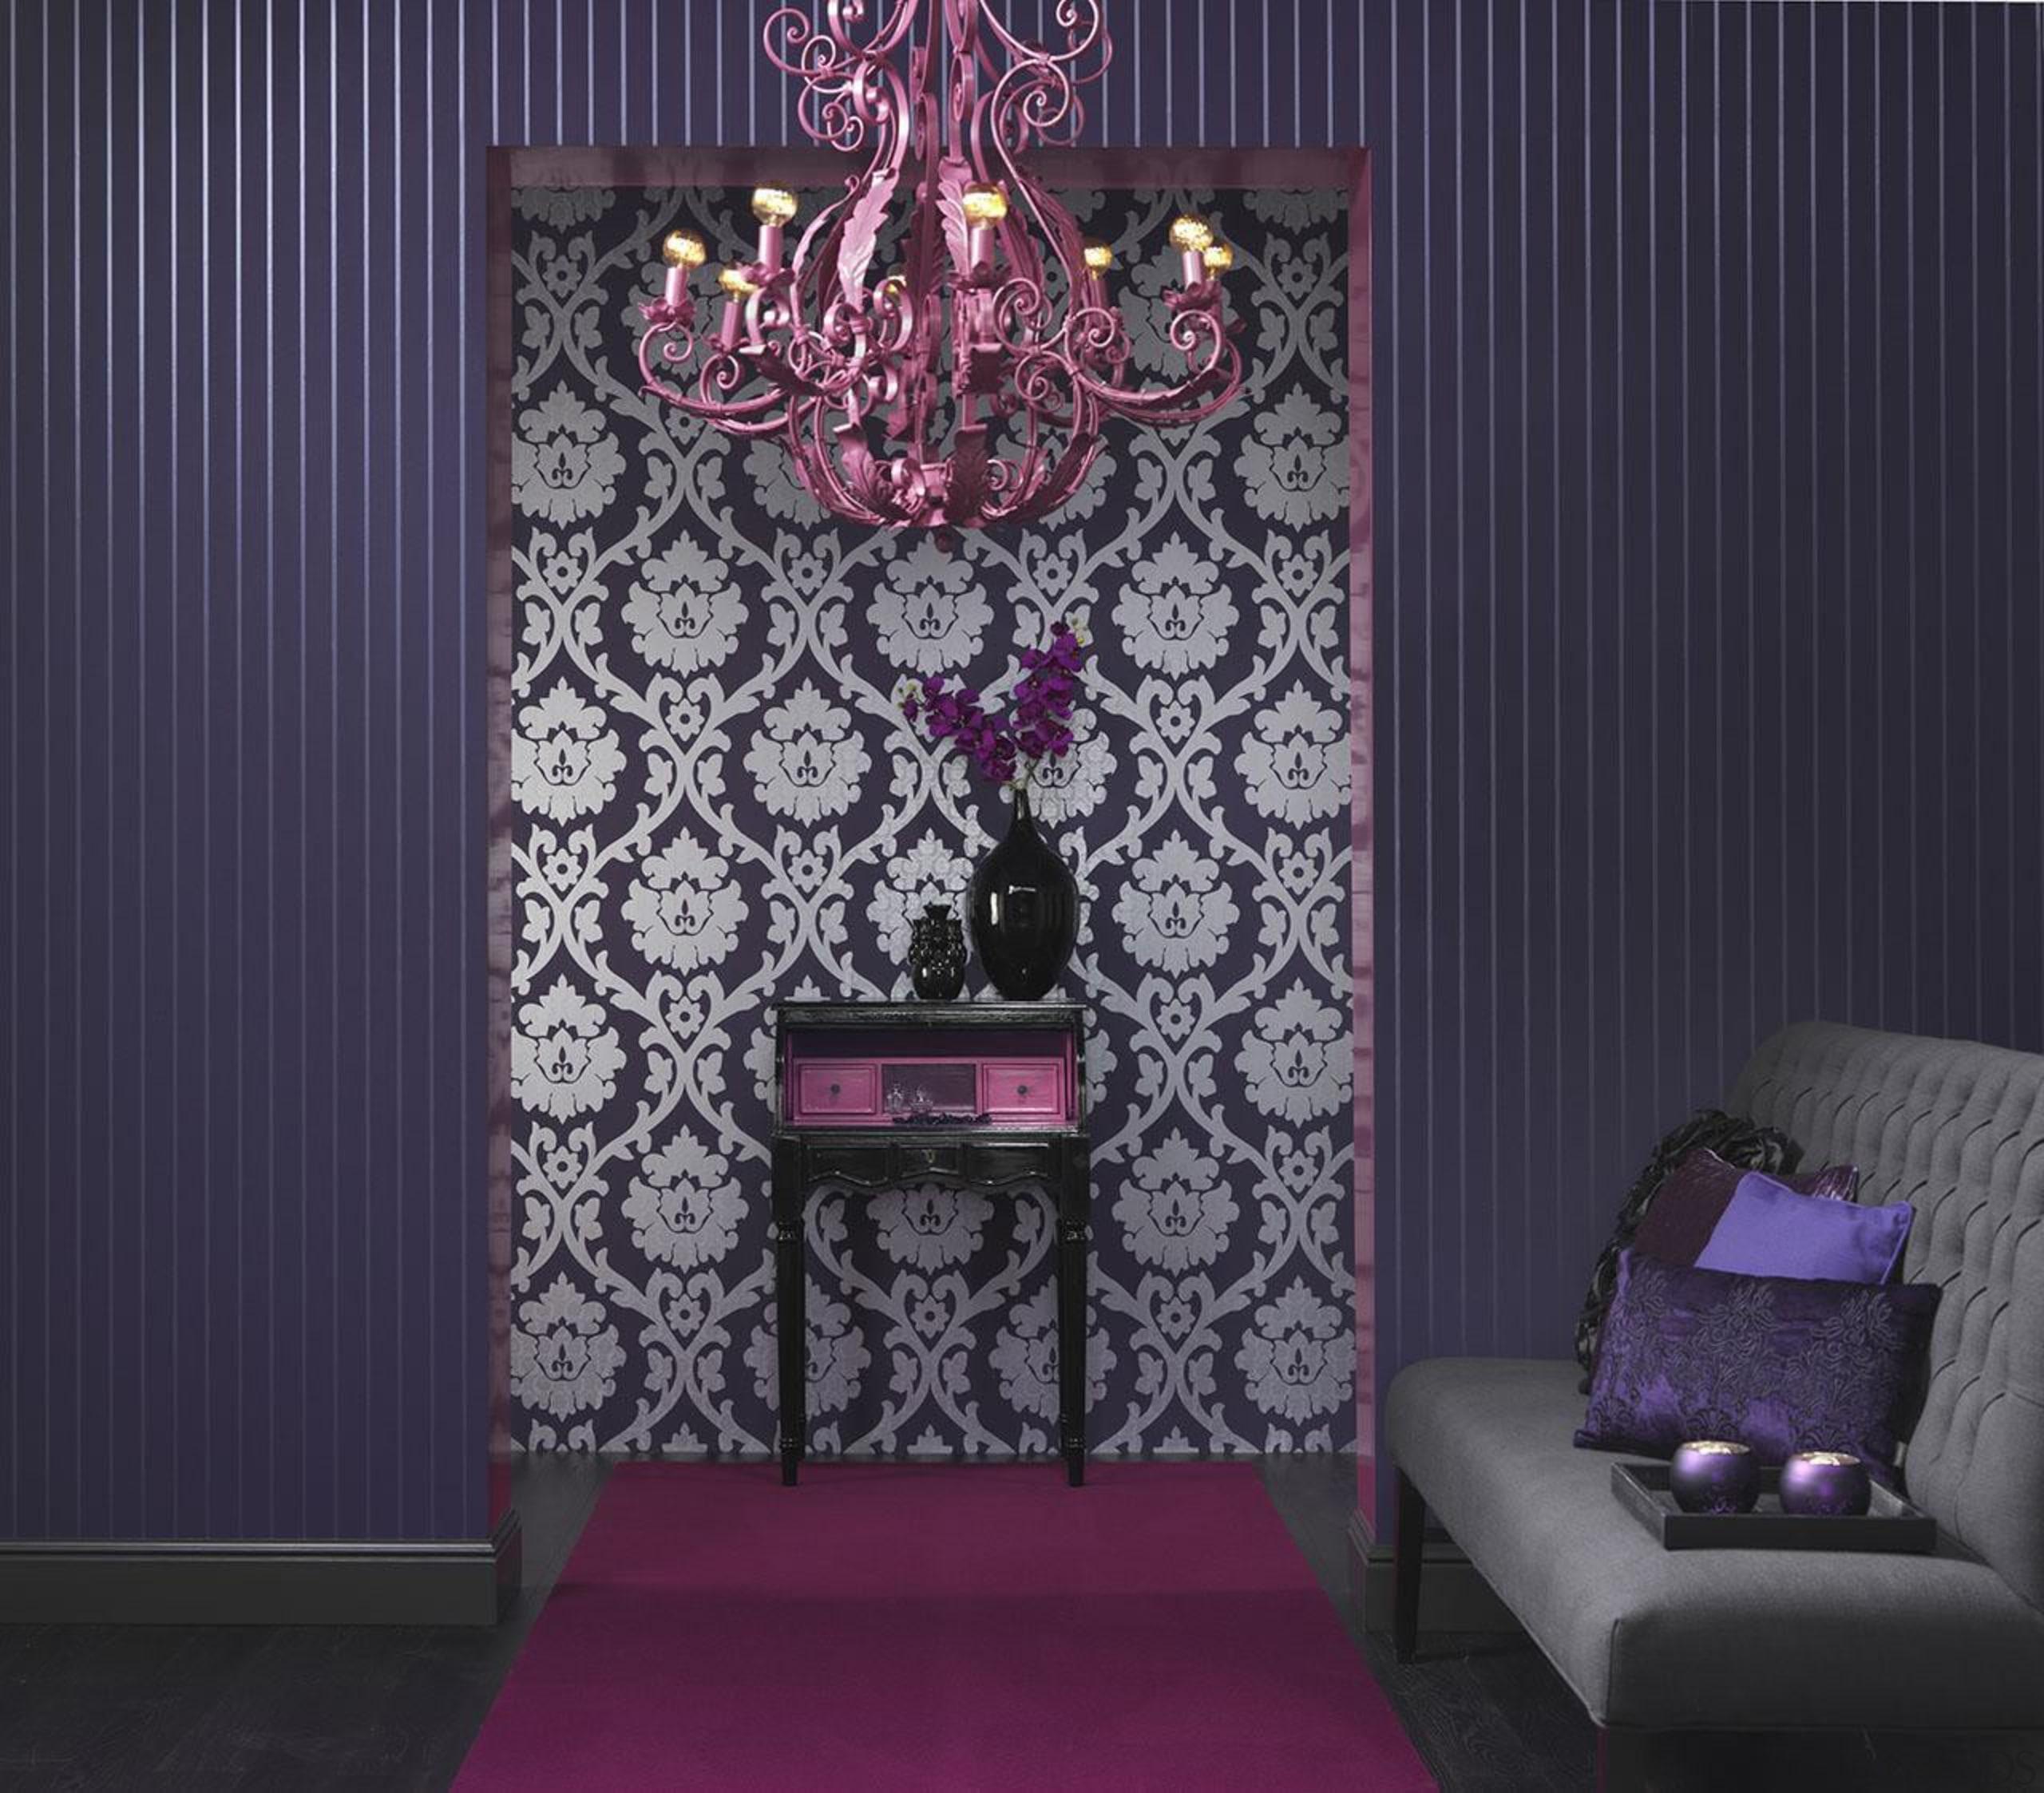 Brocante II Range - Brocante II Range - design, interior design, magenta, pattern, pink, purple, textile, violet, wall, wallpaper, purple, black